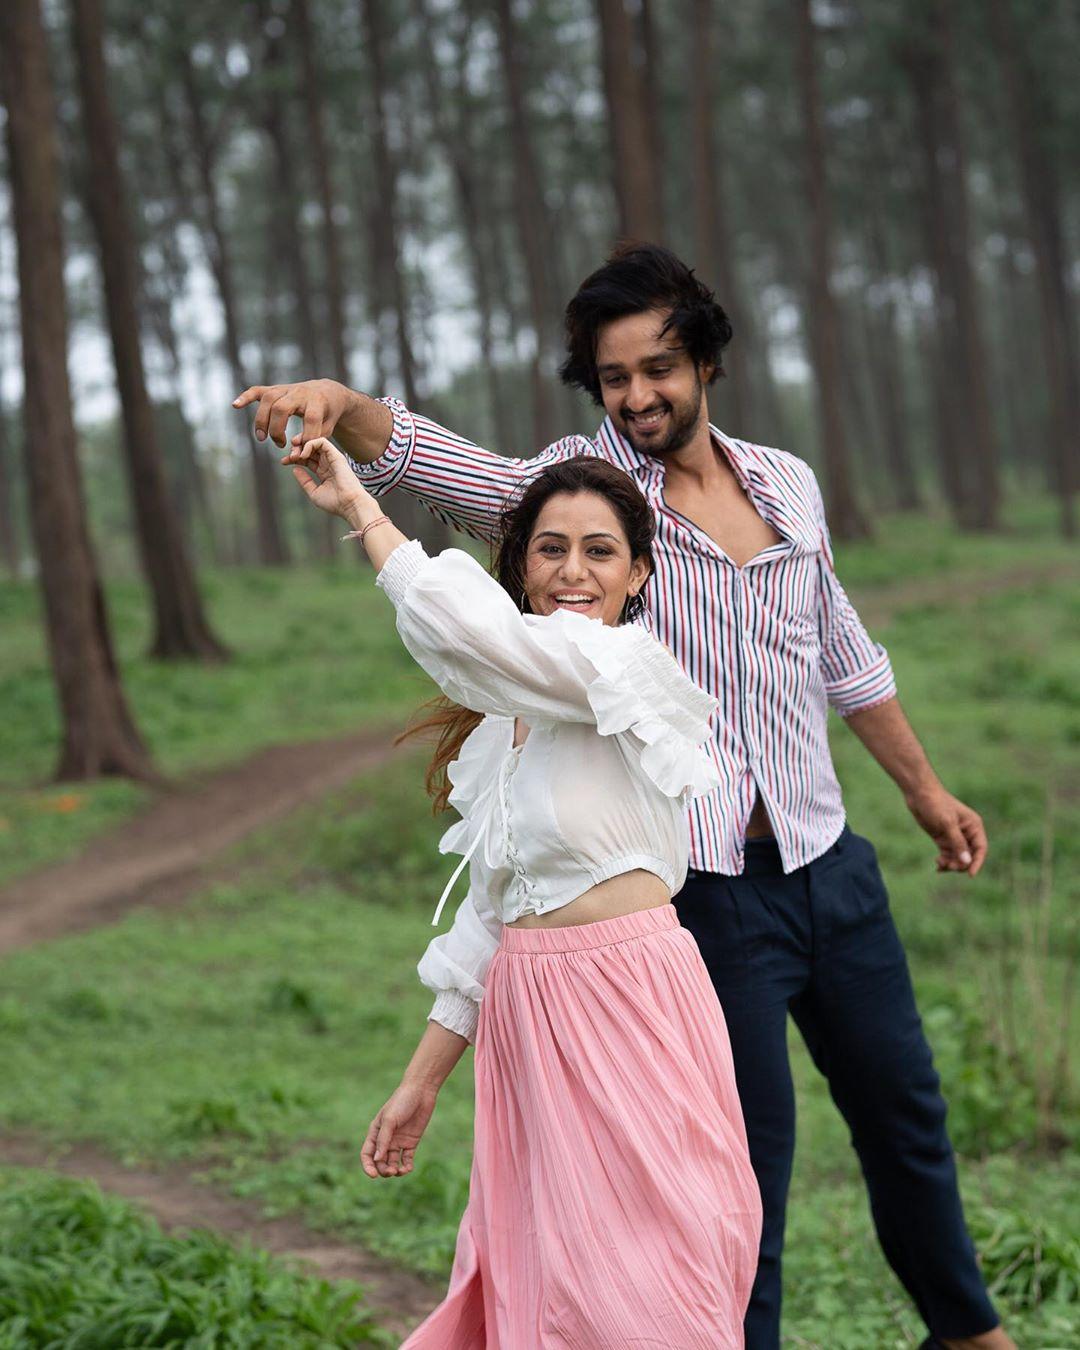 Ridhima's stunningly beautiful smile caught my attention: Sourabh Raaj Jain